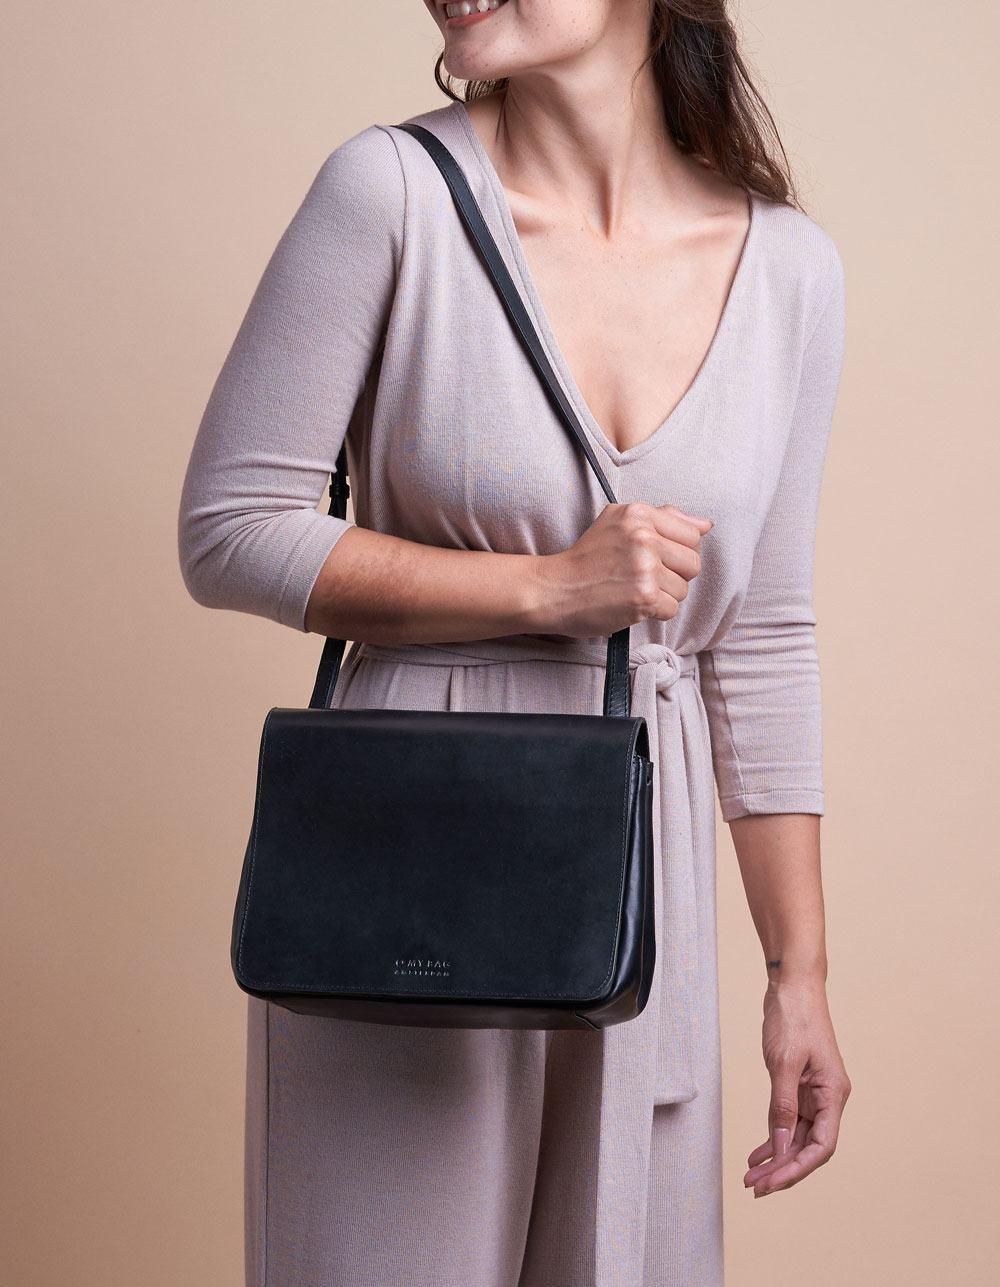 O My Bag The Lucy Bag - Eco Classic Black